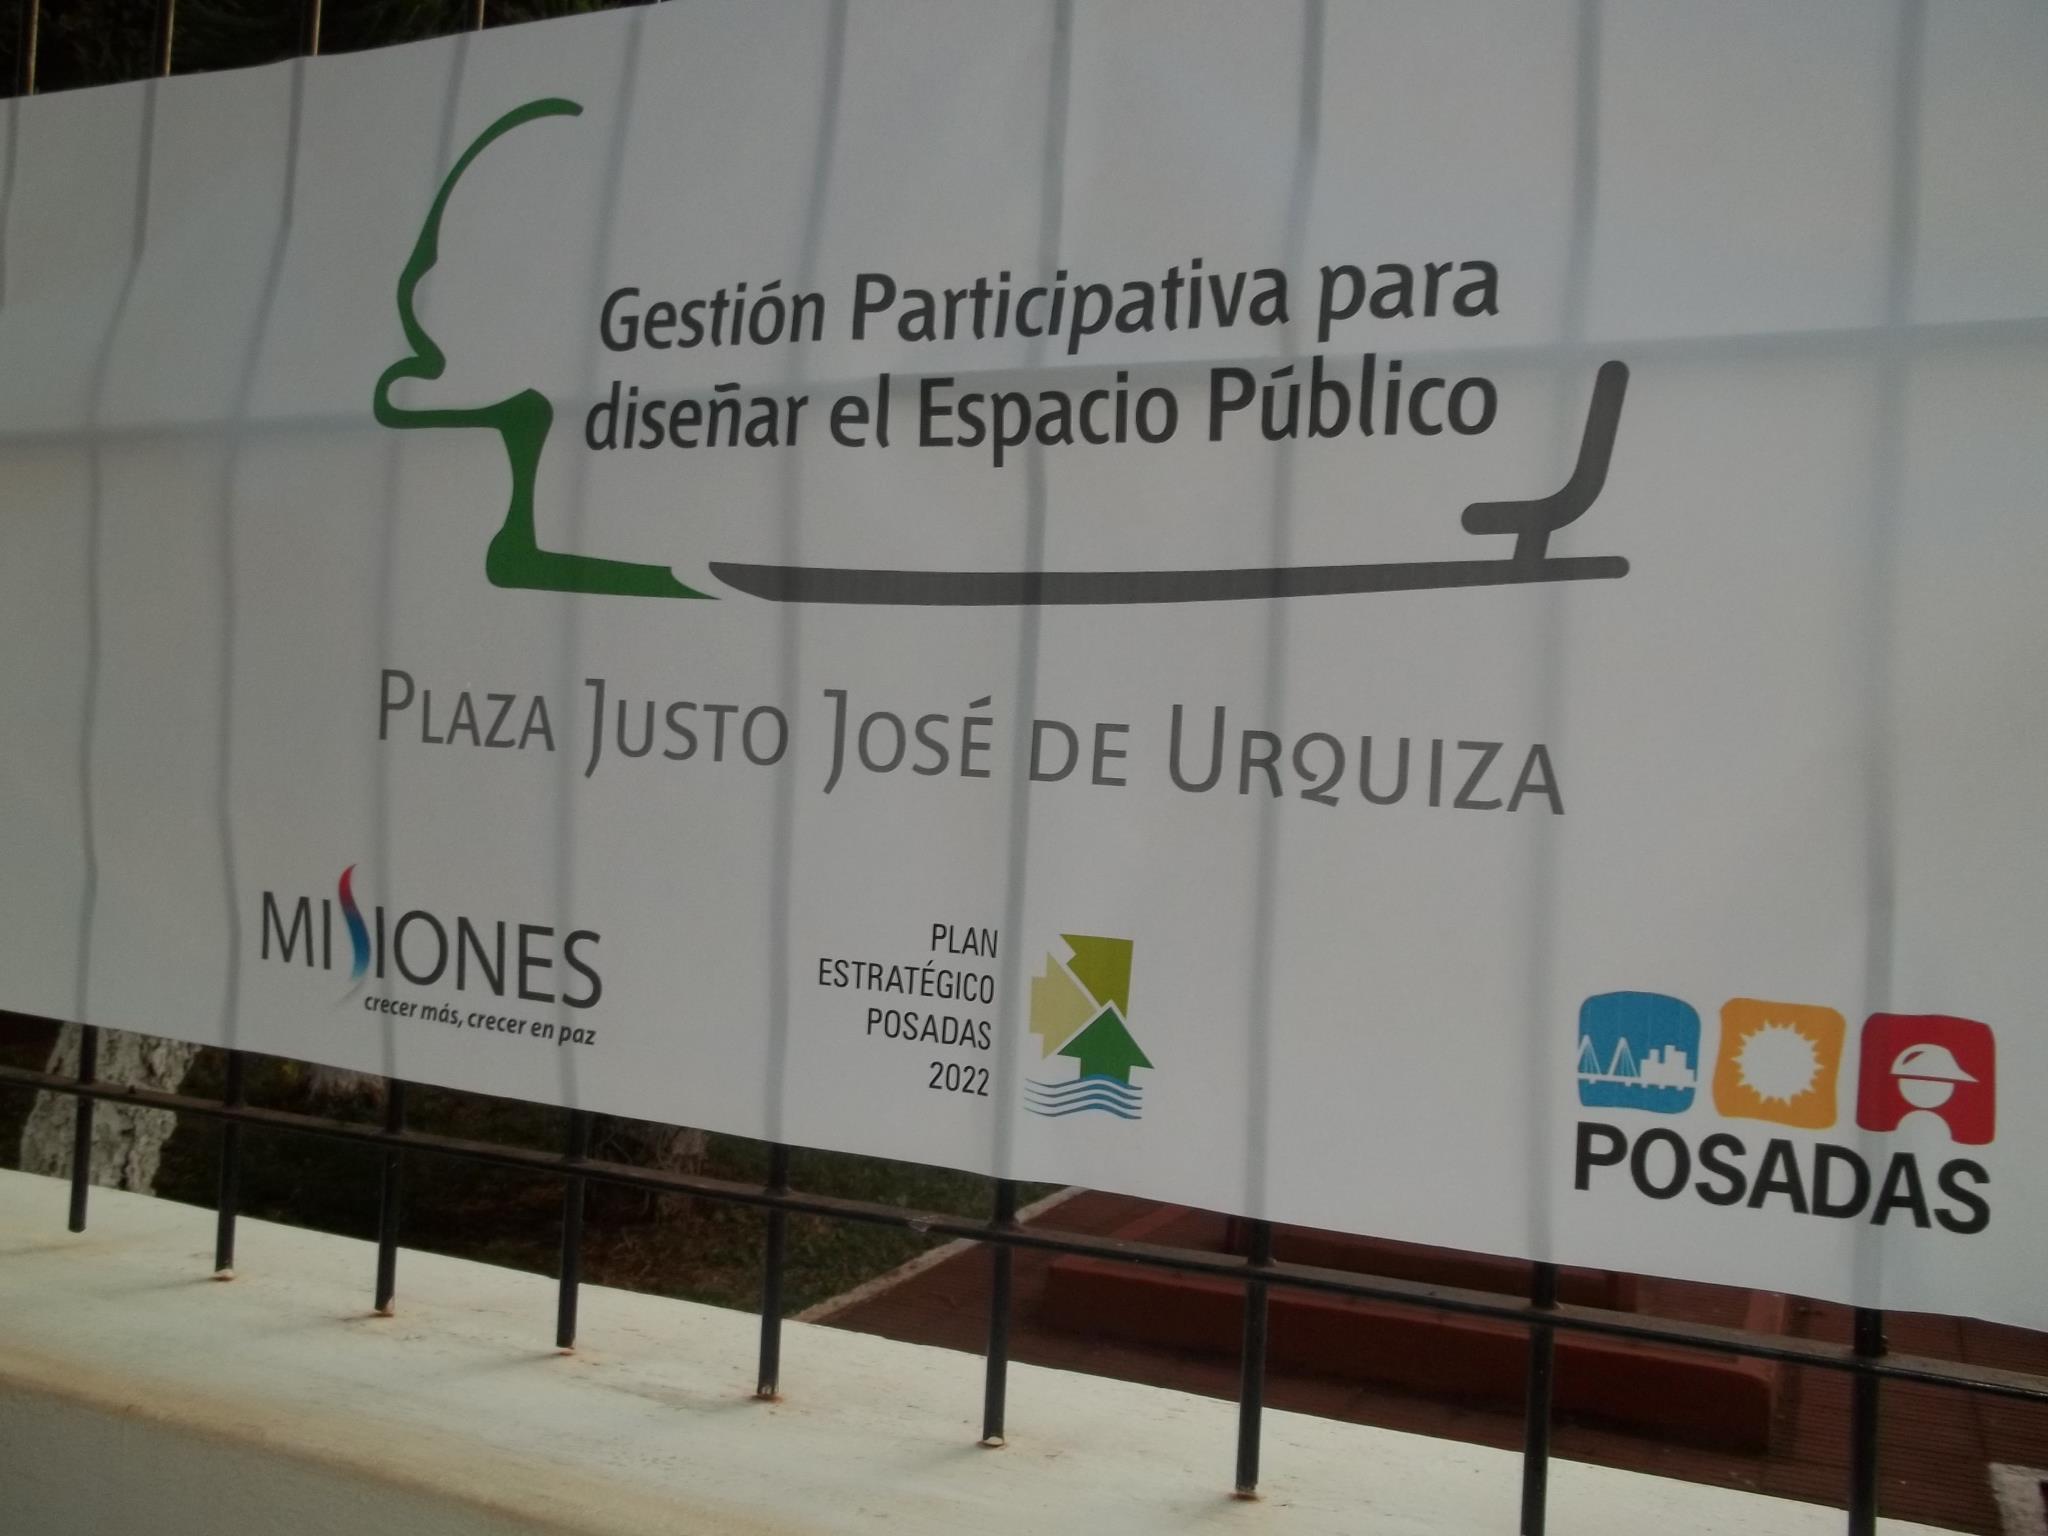 Etapas Plaza Justo José de Urquiza